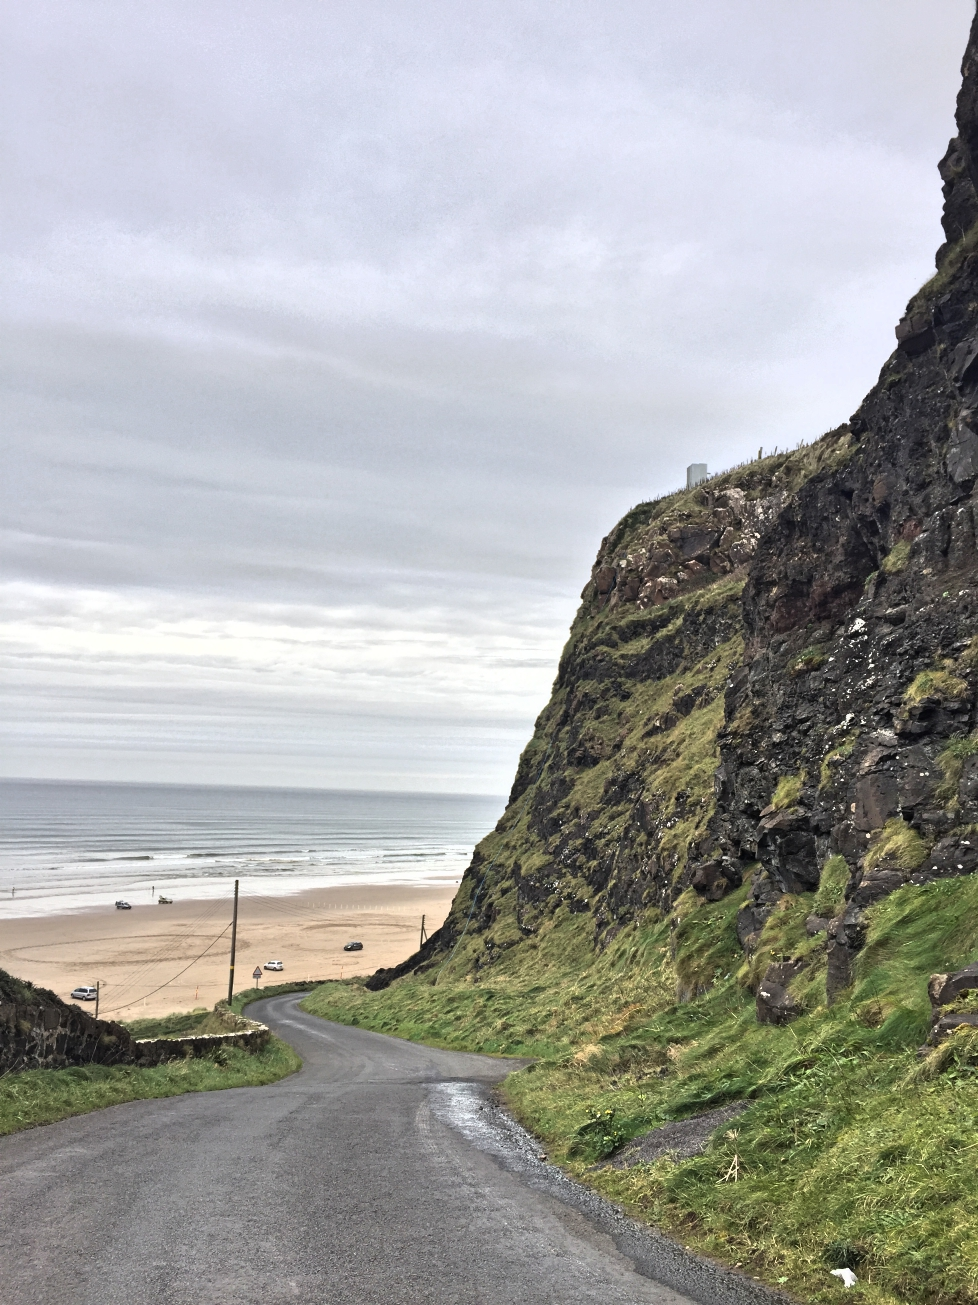 benone_beach_downhill_londonderry_limavady_niexplorer_ni_explorer_northern_ireland (9).jpg